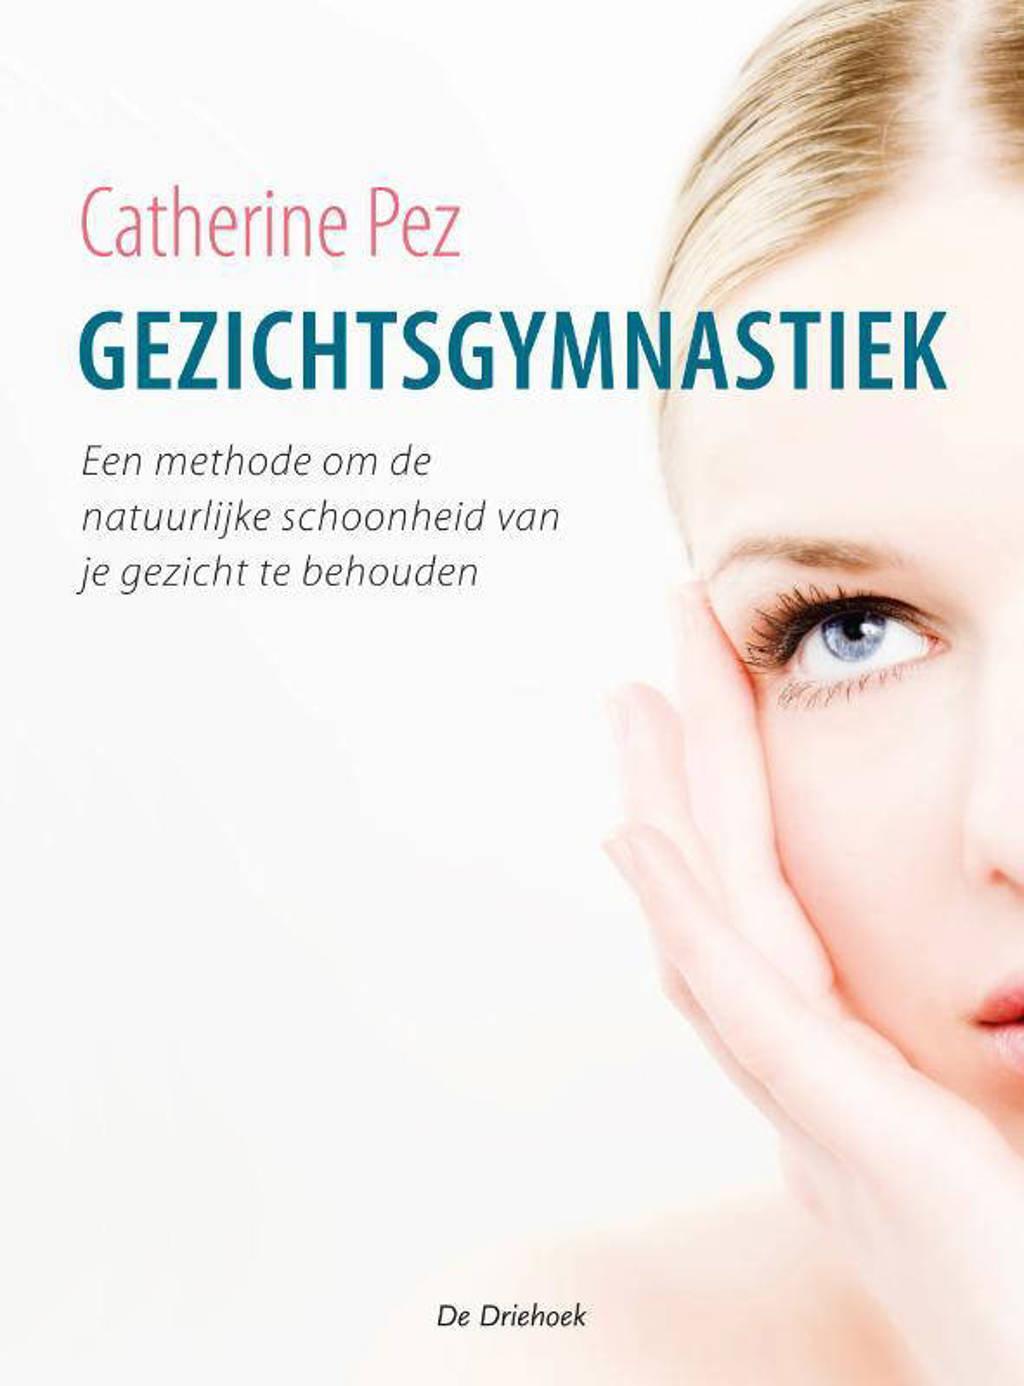 Gezichtsgymnastiek - Catherine Pez